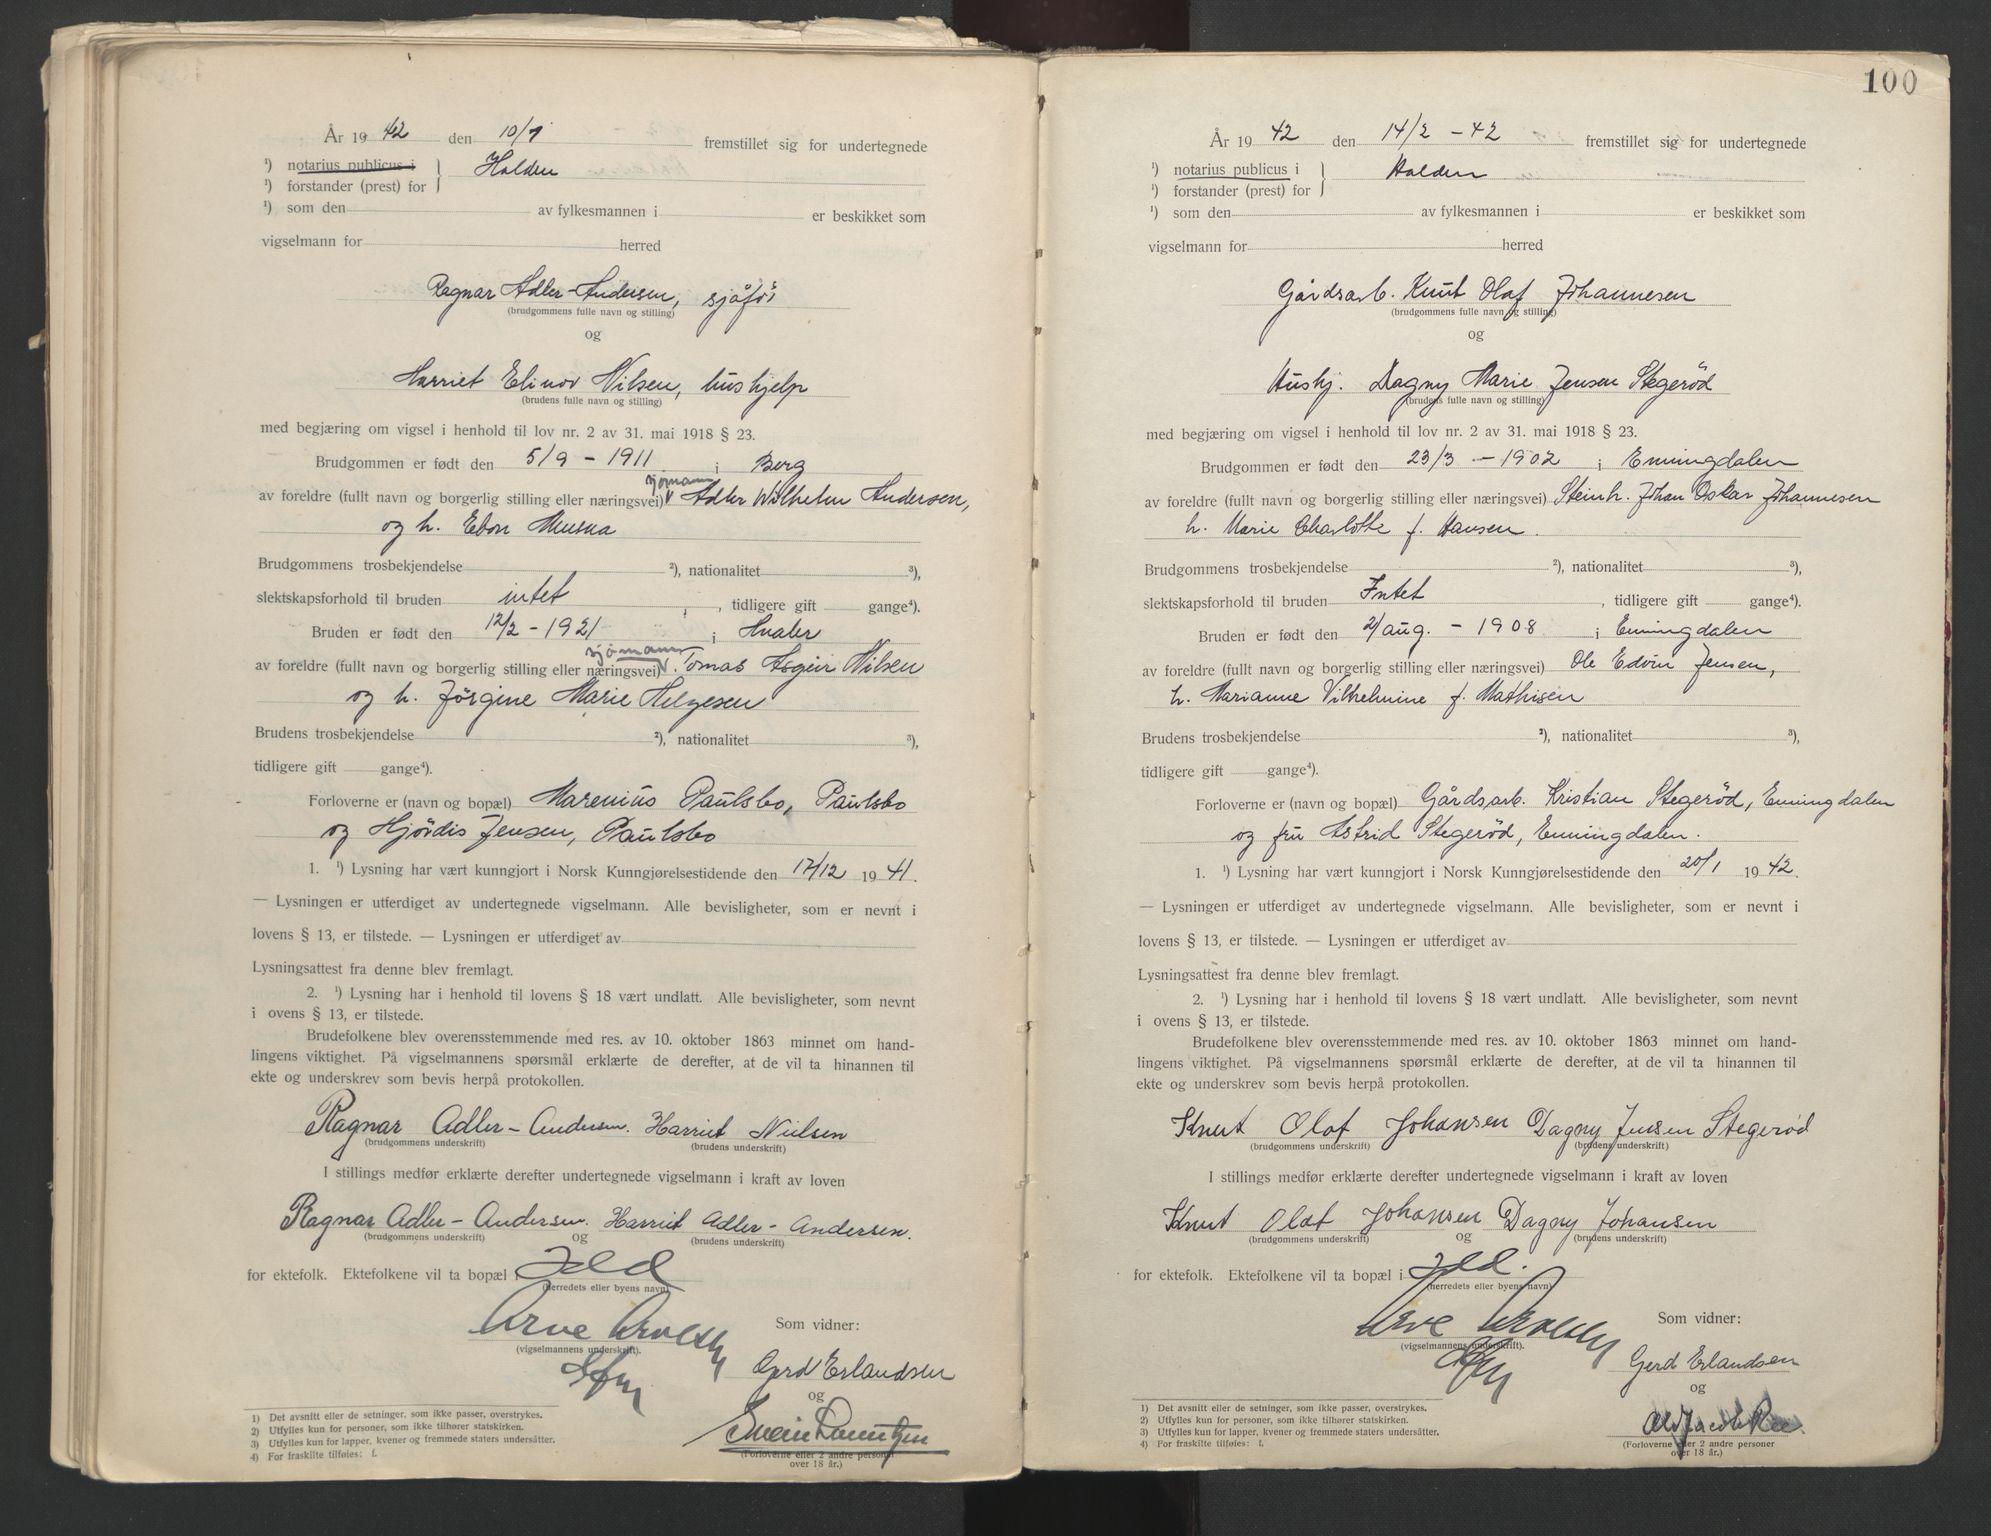 SAO, Idd og Marker sorenskriveri, L/Lc/L0001: Vigselsbøker, 1920-1942, s. 100